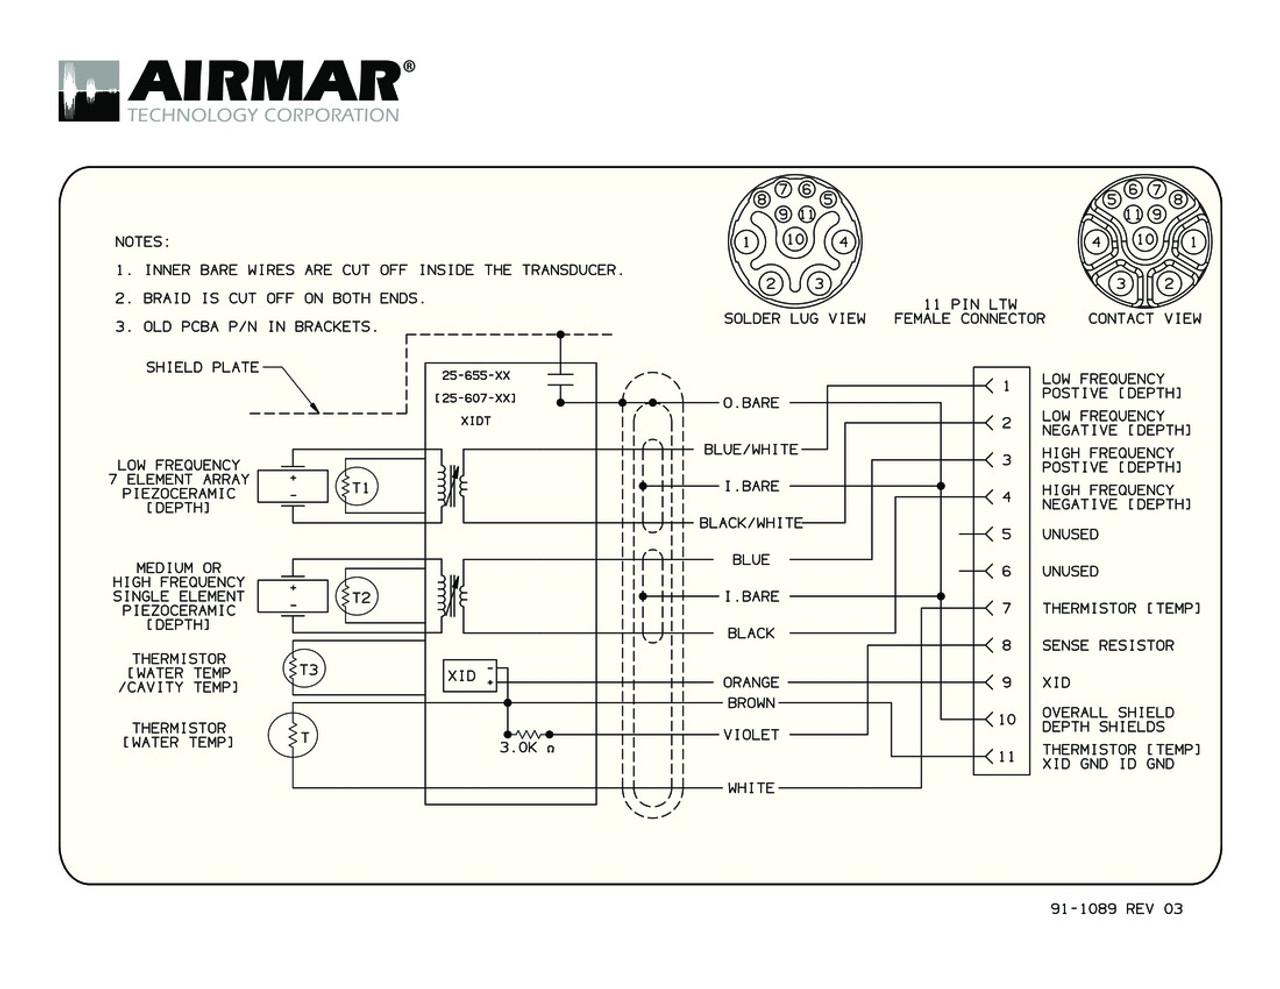 hubbell airmar wiring diagram tm265 blue bottle marine on pioneer wiring diagrams garmin wiring diagrams airmar wiring diagram raymarine  [ 1100 x 850 Pixel ]